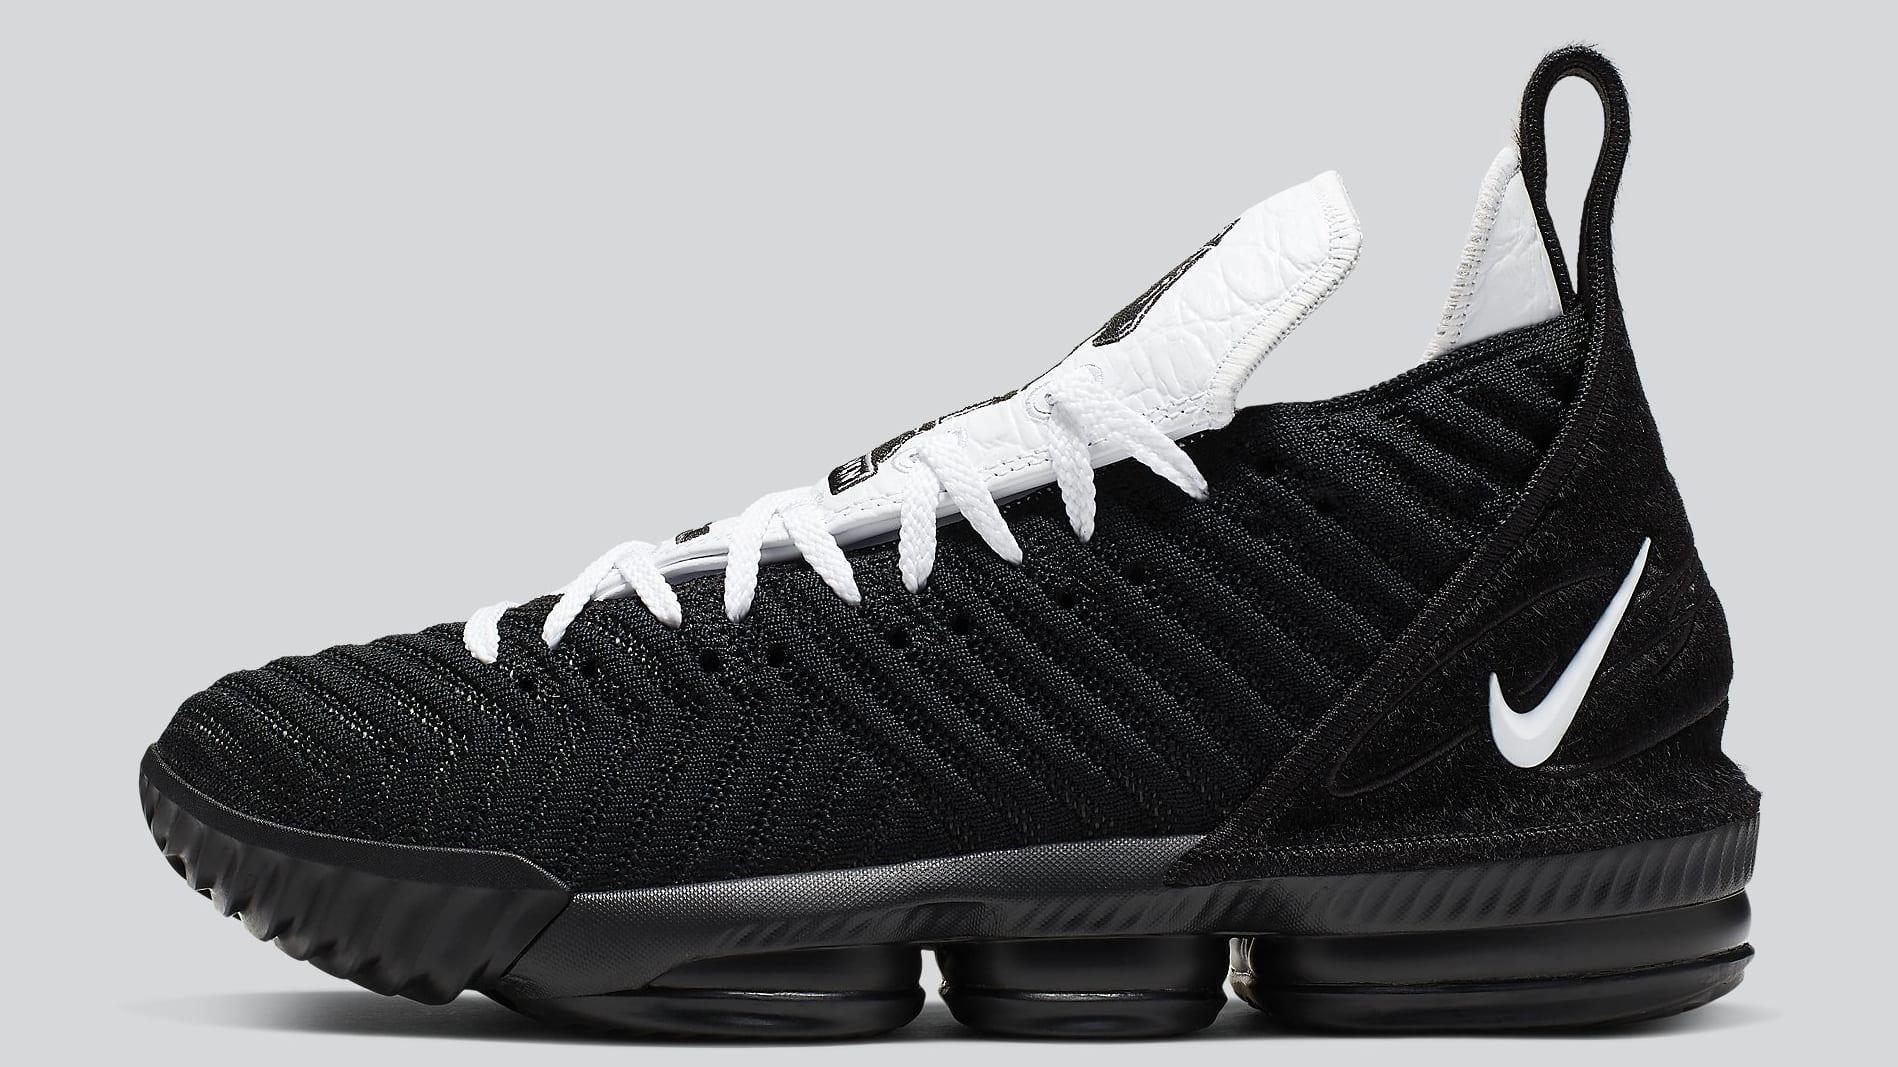 Nike LeBron 16 Horsemen Release Date CI7862-001 Profile